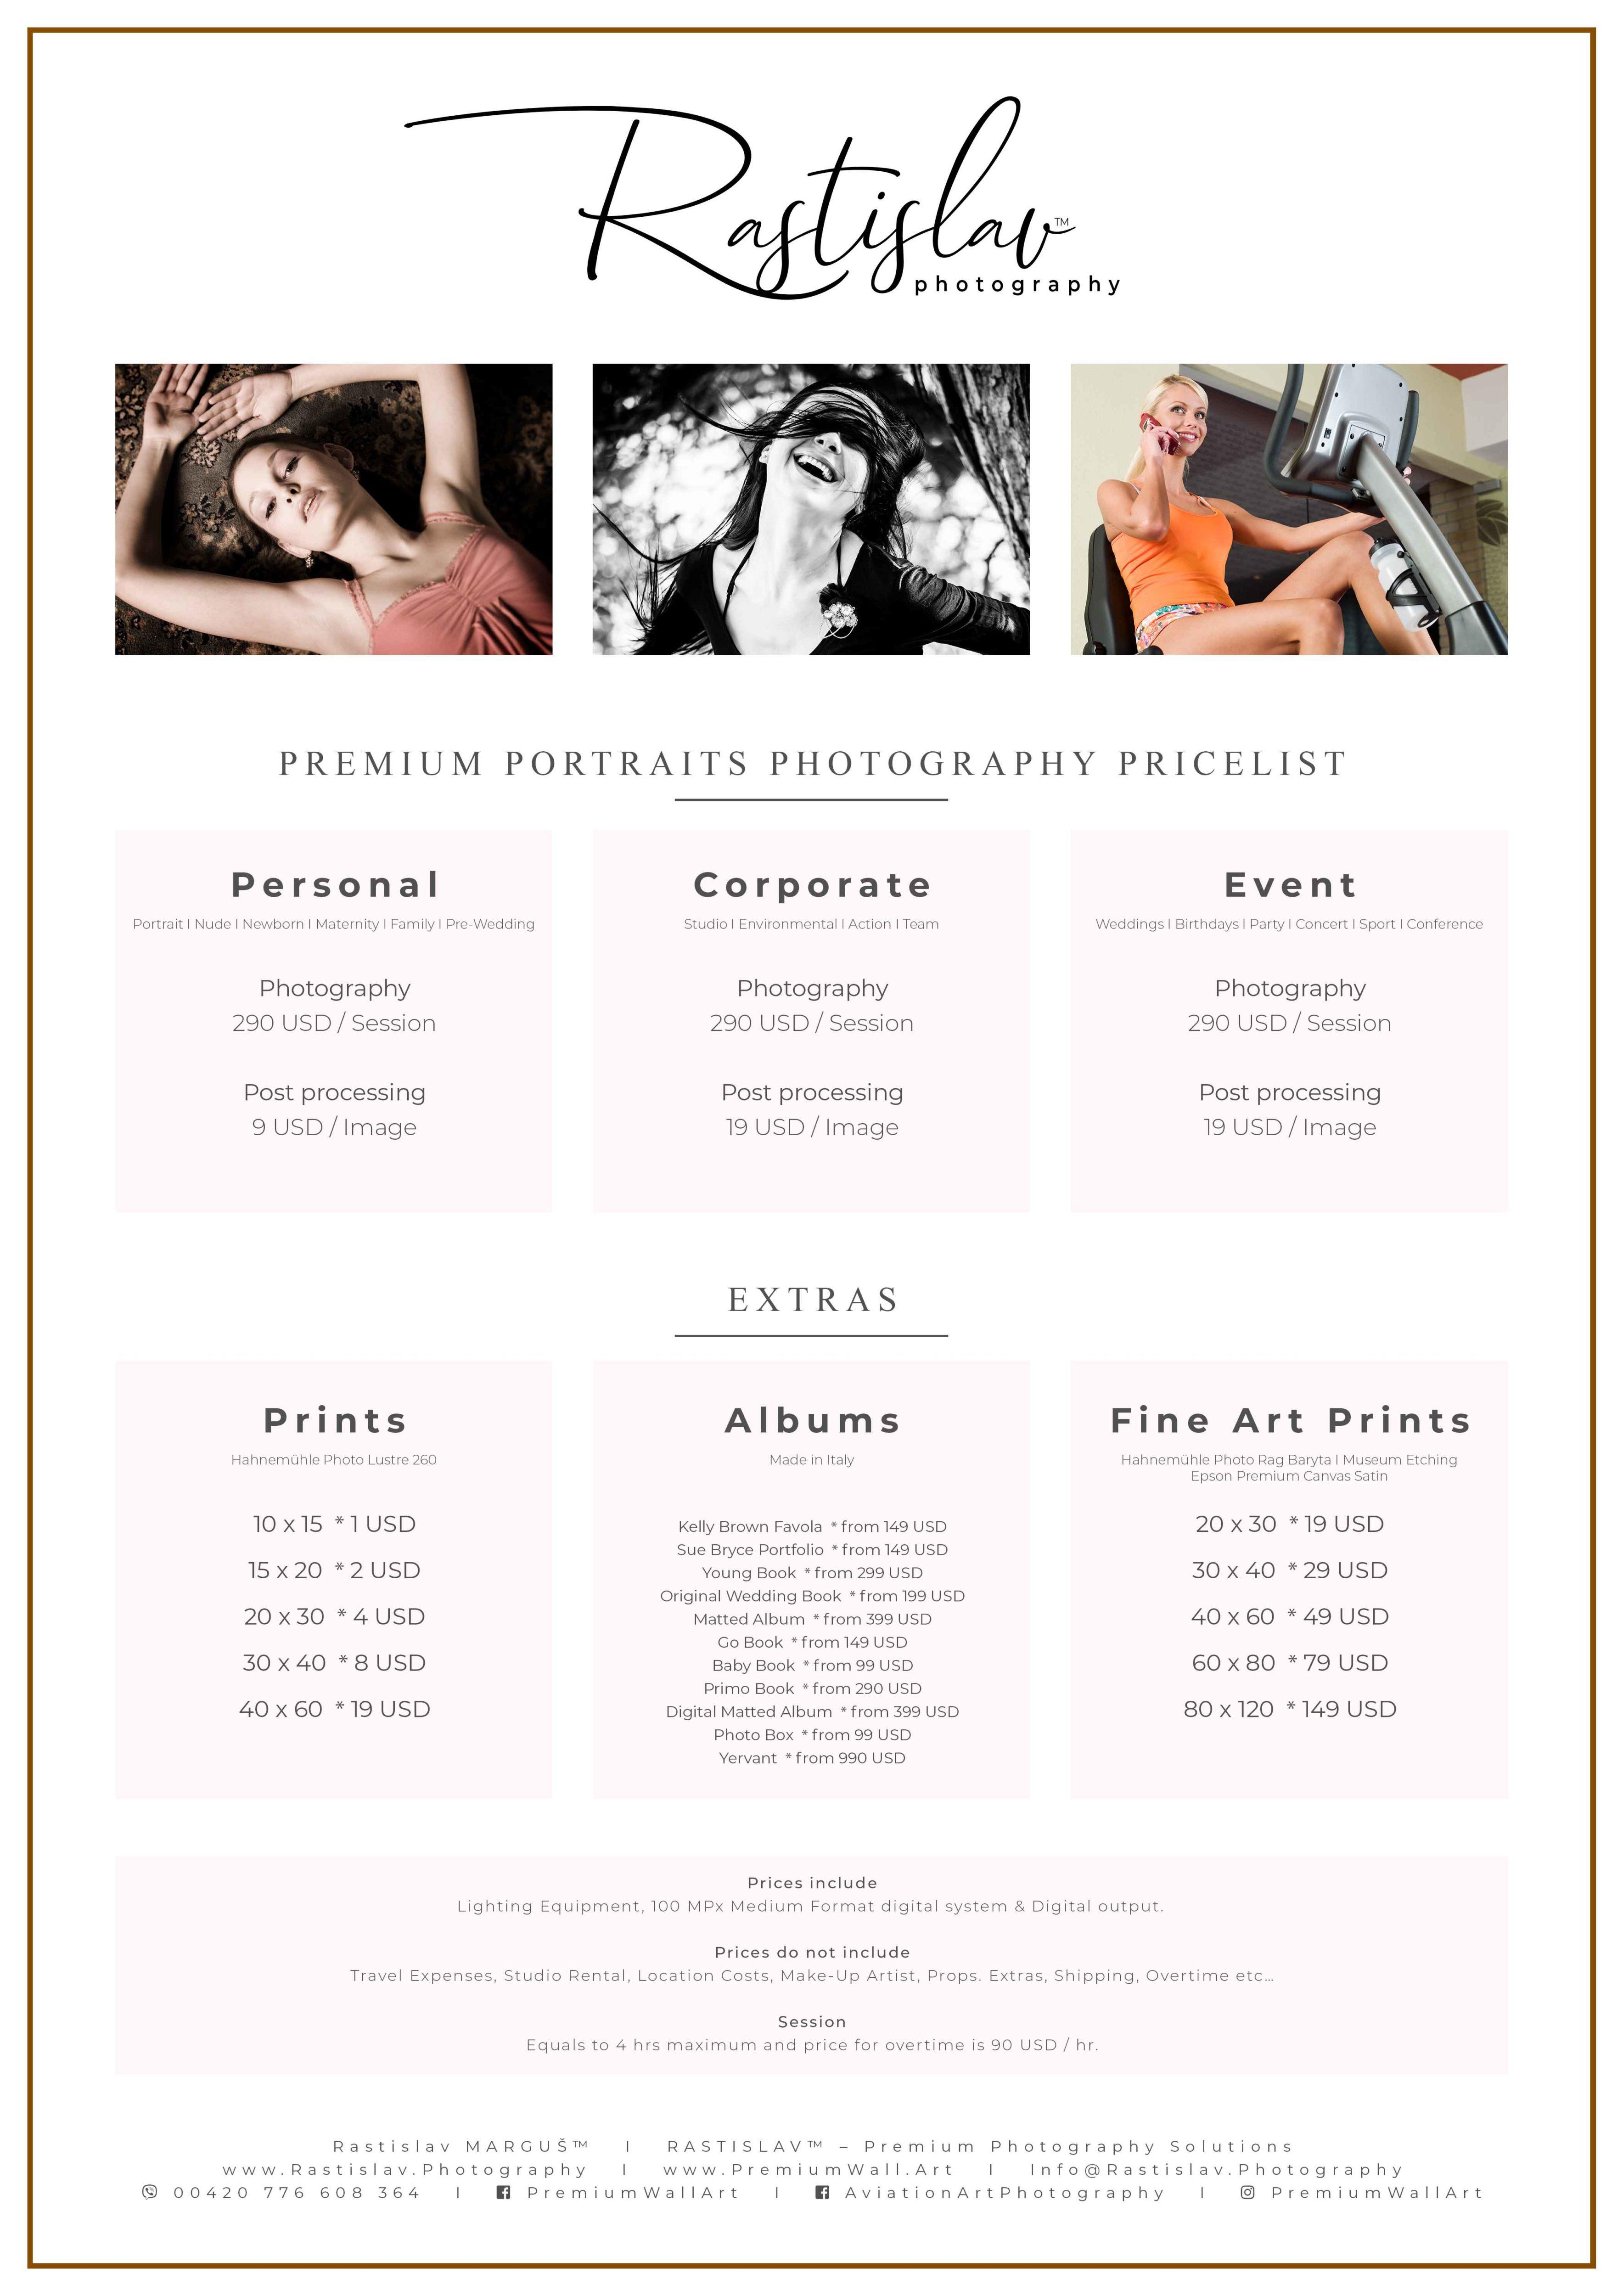 Premium Portraits Pricelist